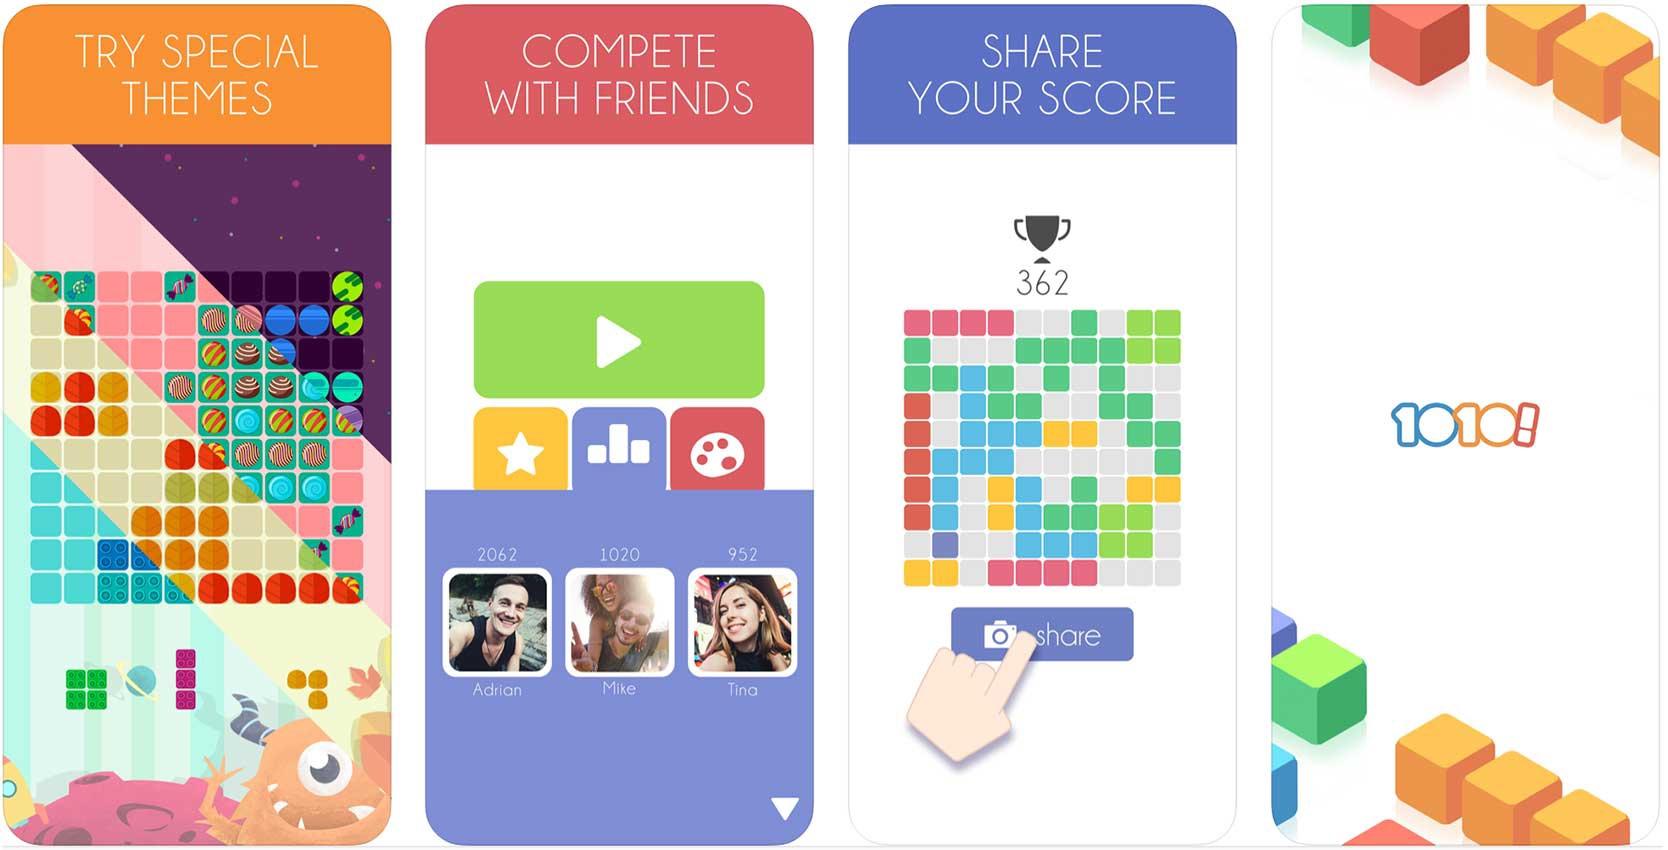 screenshot of 1010 iPhone game